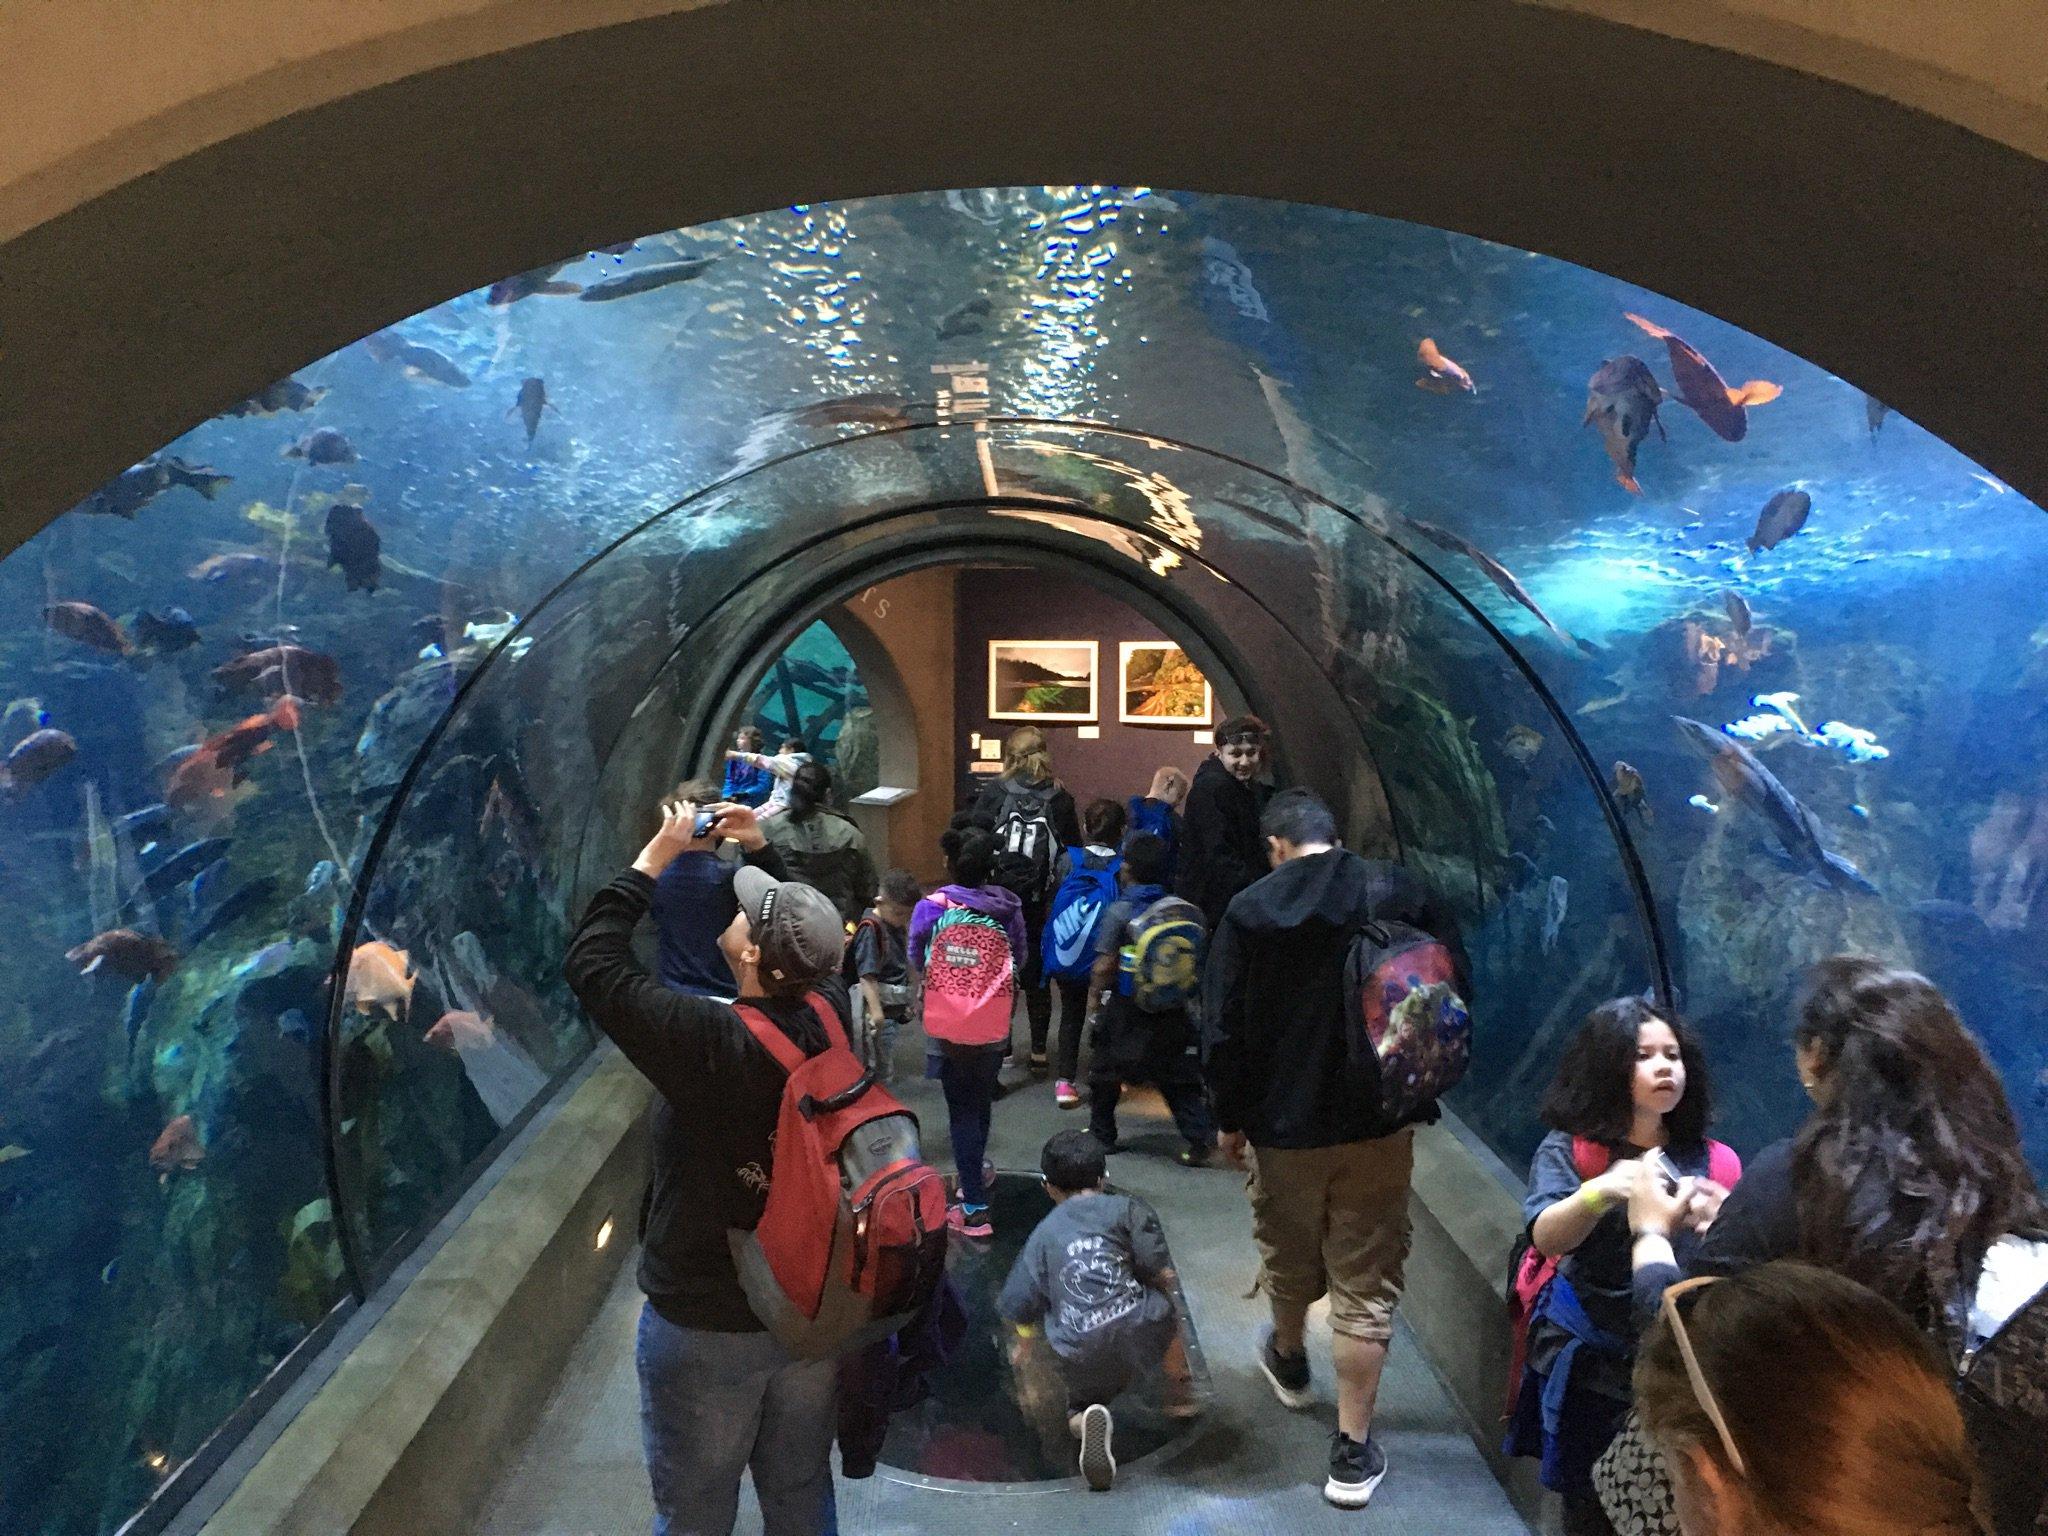 Current status: School of fish/class…